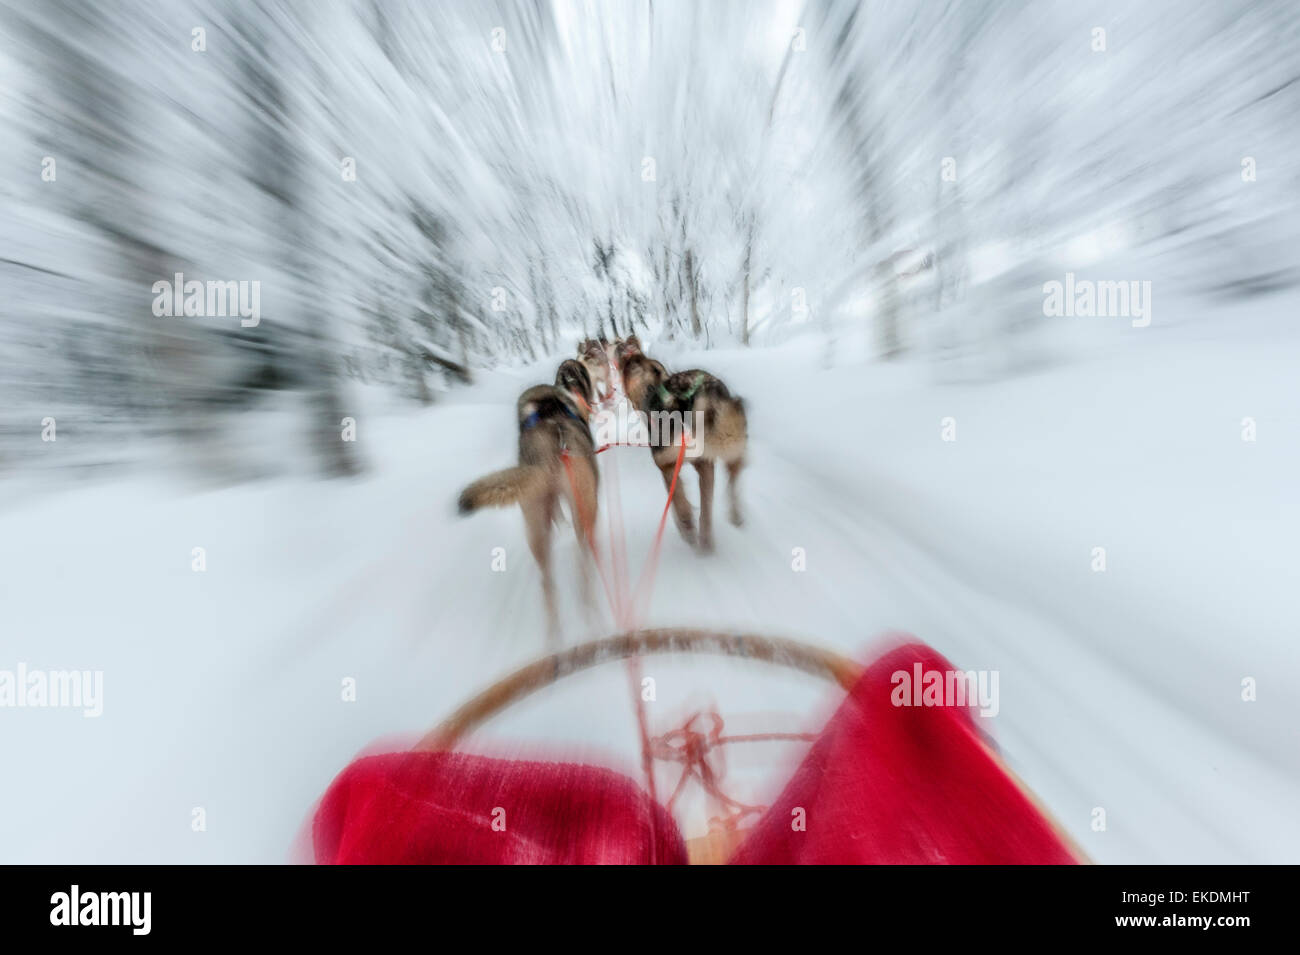 Husky sled tour. Kongass. Levi. Finland. Lapland. Scandinavia - Stock Image